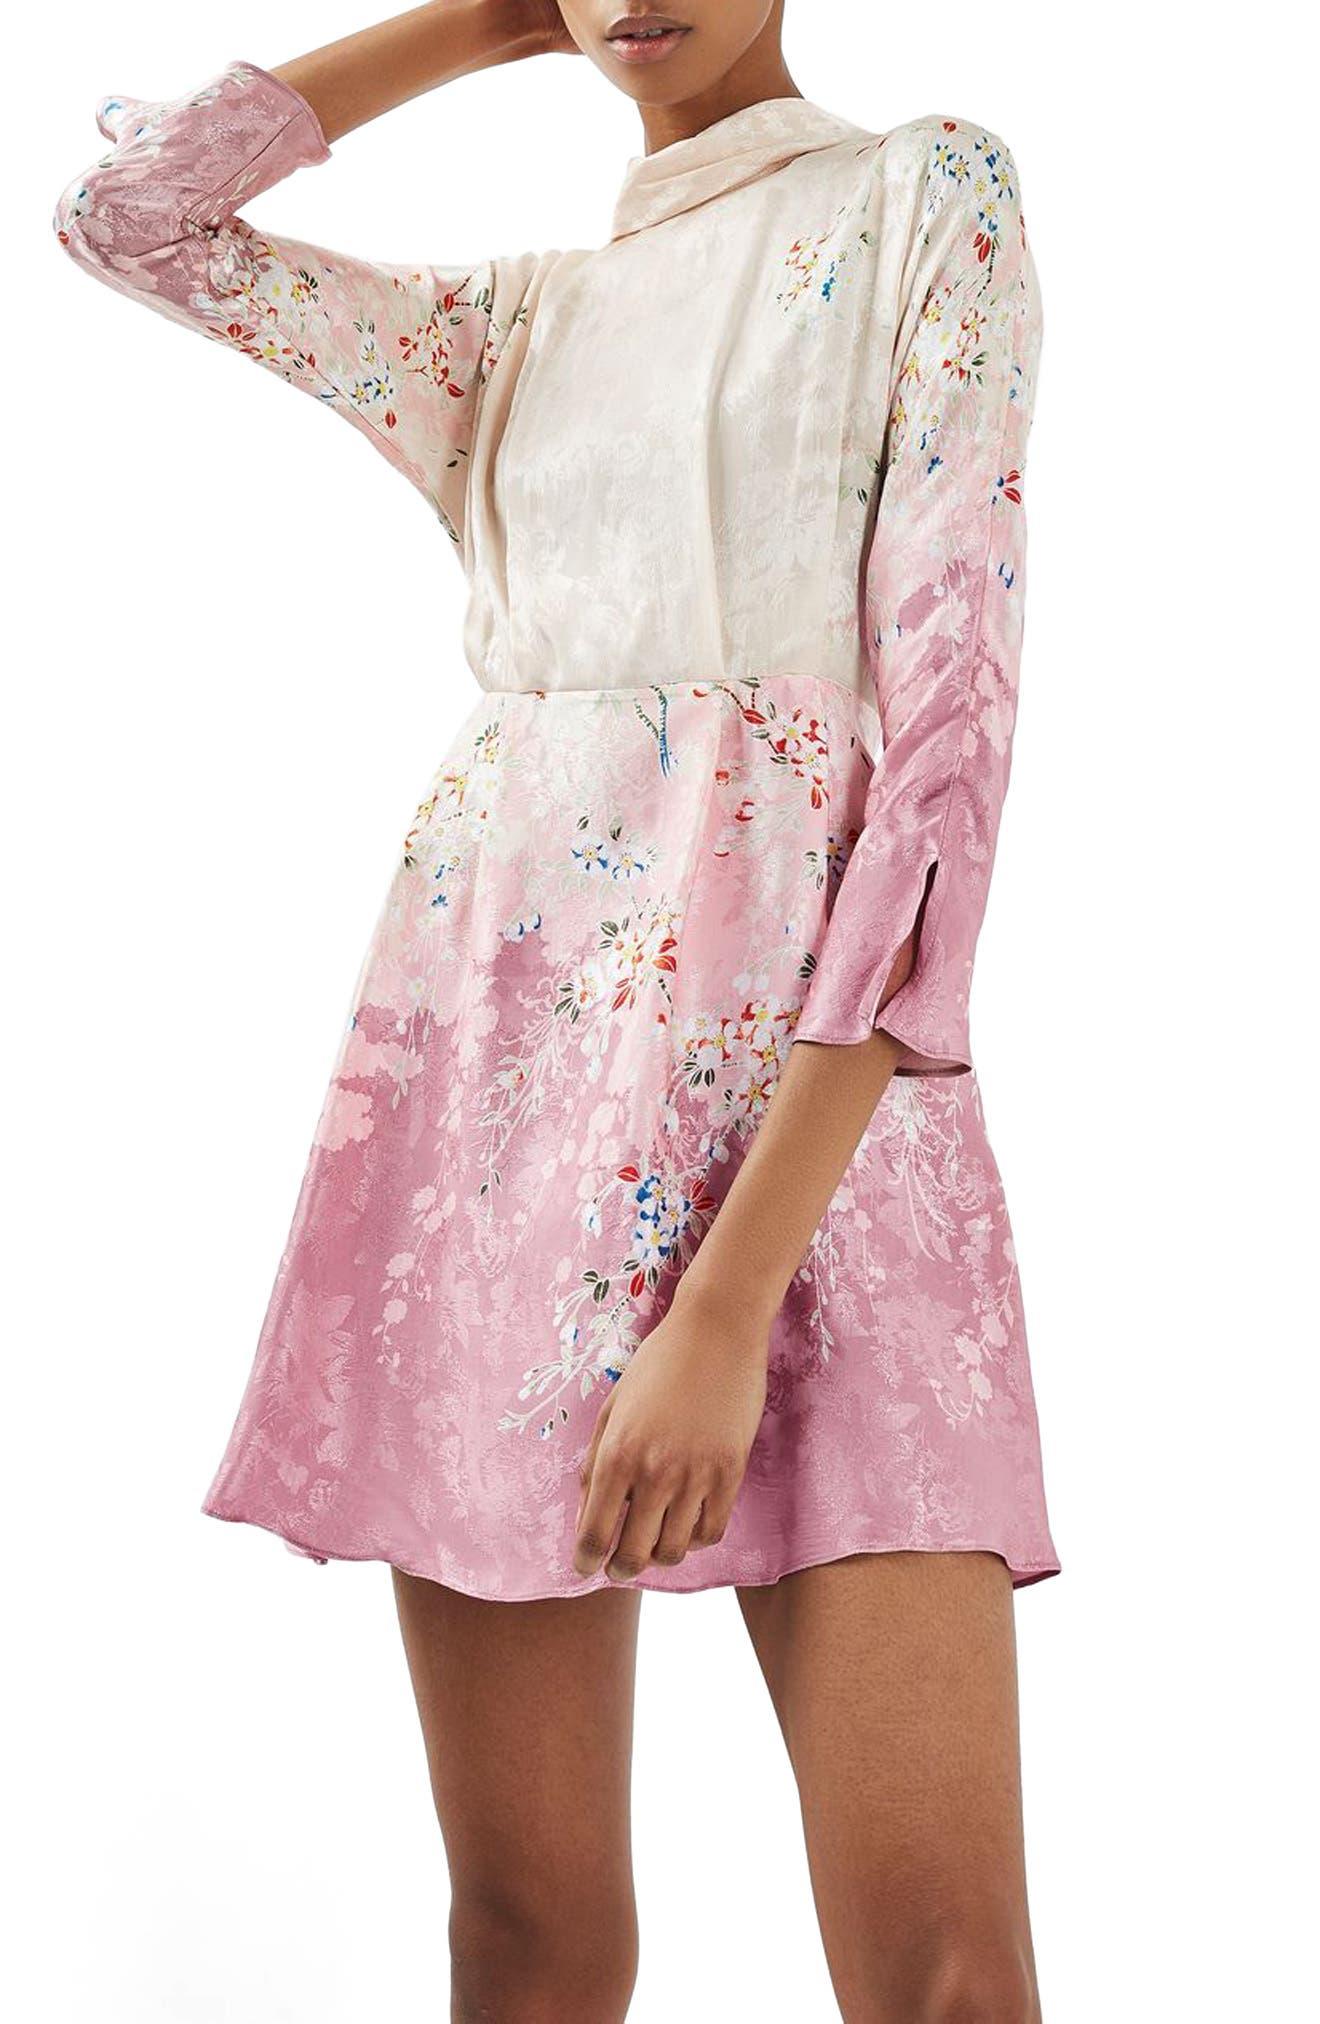 Jacquard Floral Print Dress,                         Main,                         color, 680